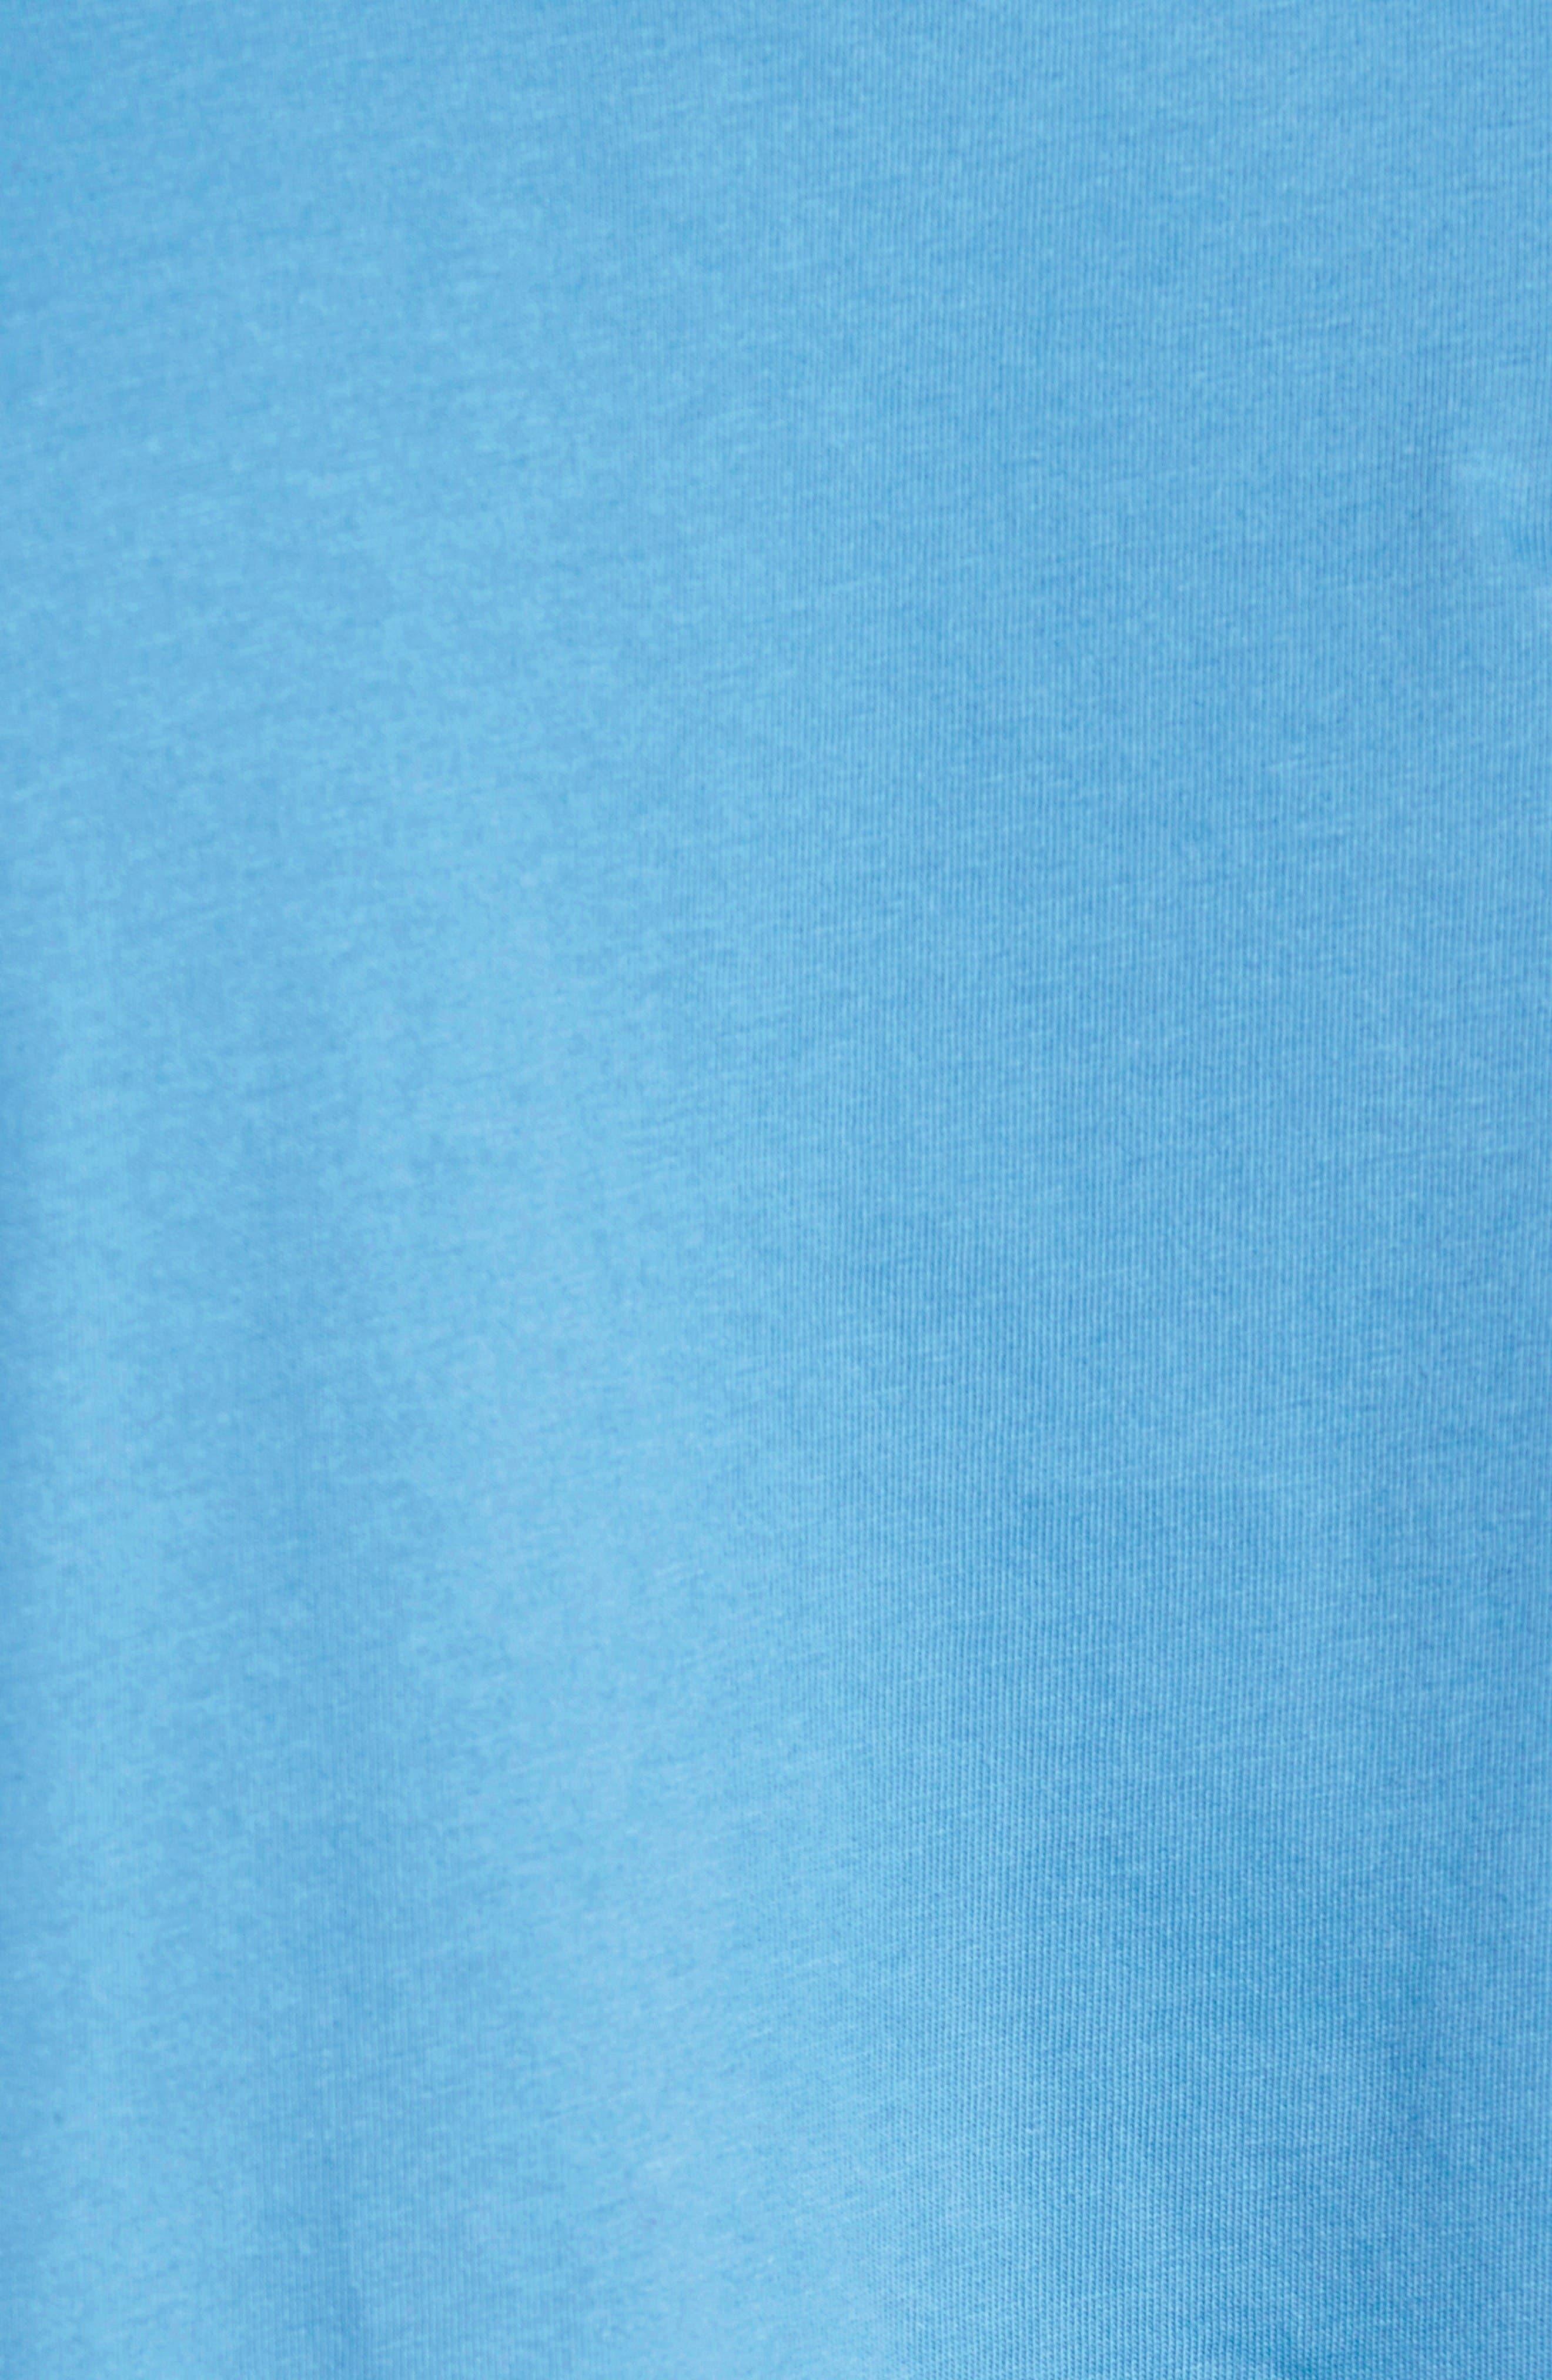 'Trout Fitz Roy' Organic Cotton Polo,                             Alternate thumbnail 12, color,                             Radar Blue